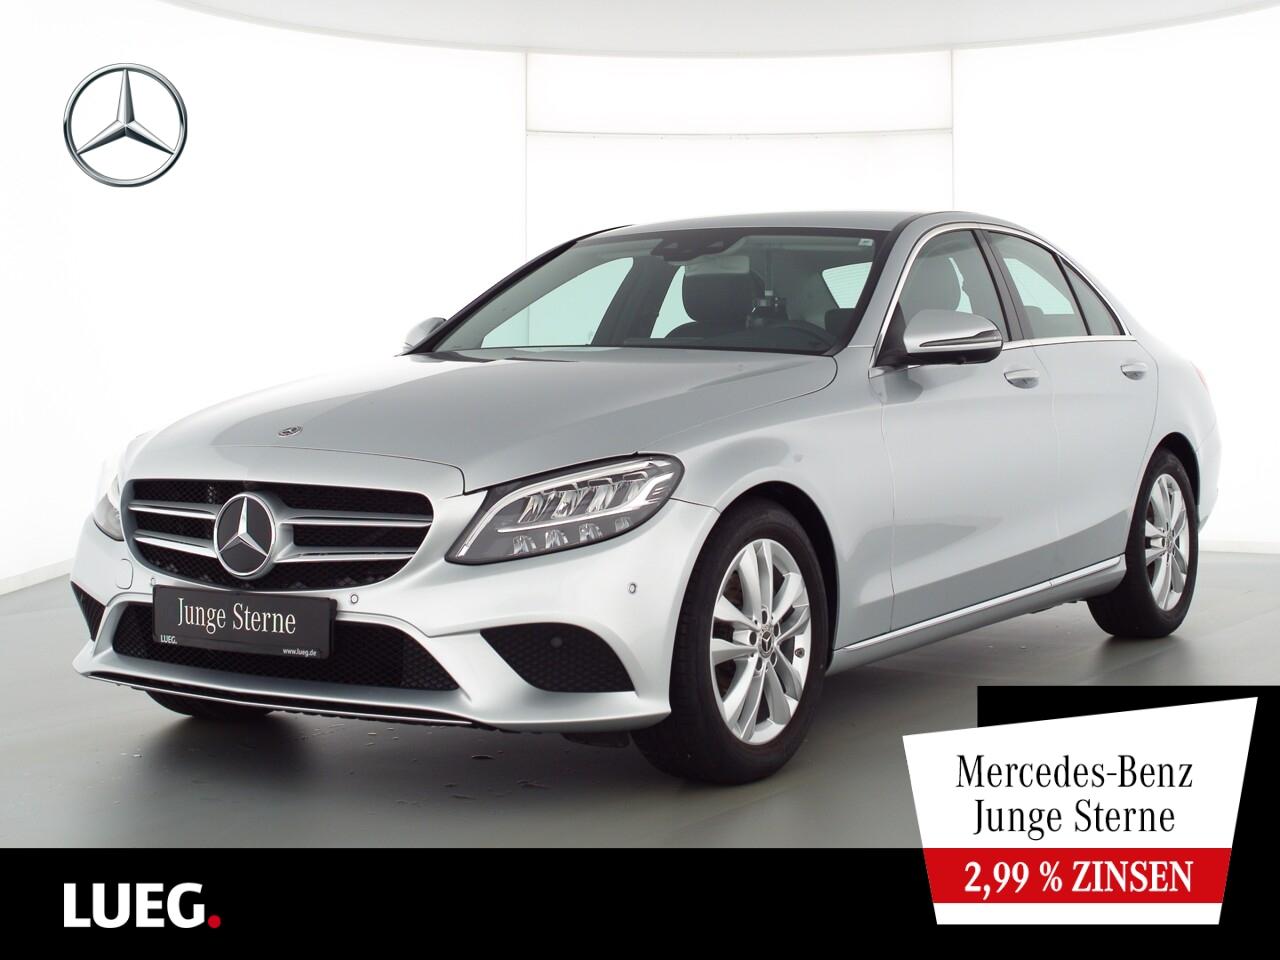 Mercedes-Benz C 200 d Avantgarde+COM+LED-HP+SpurP+HUD+CarP+360, Jahr 2019, Diesel